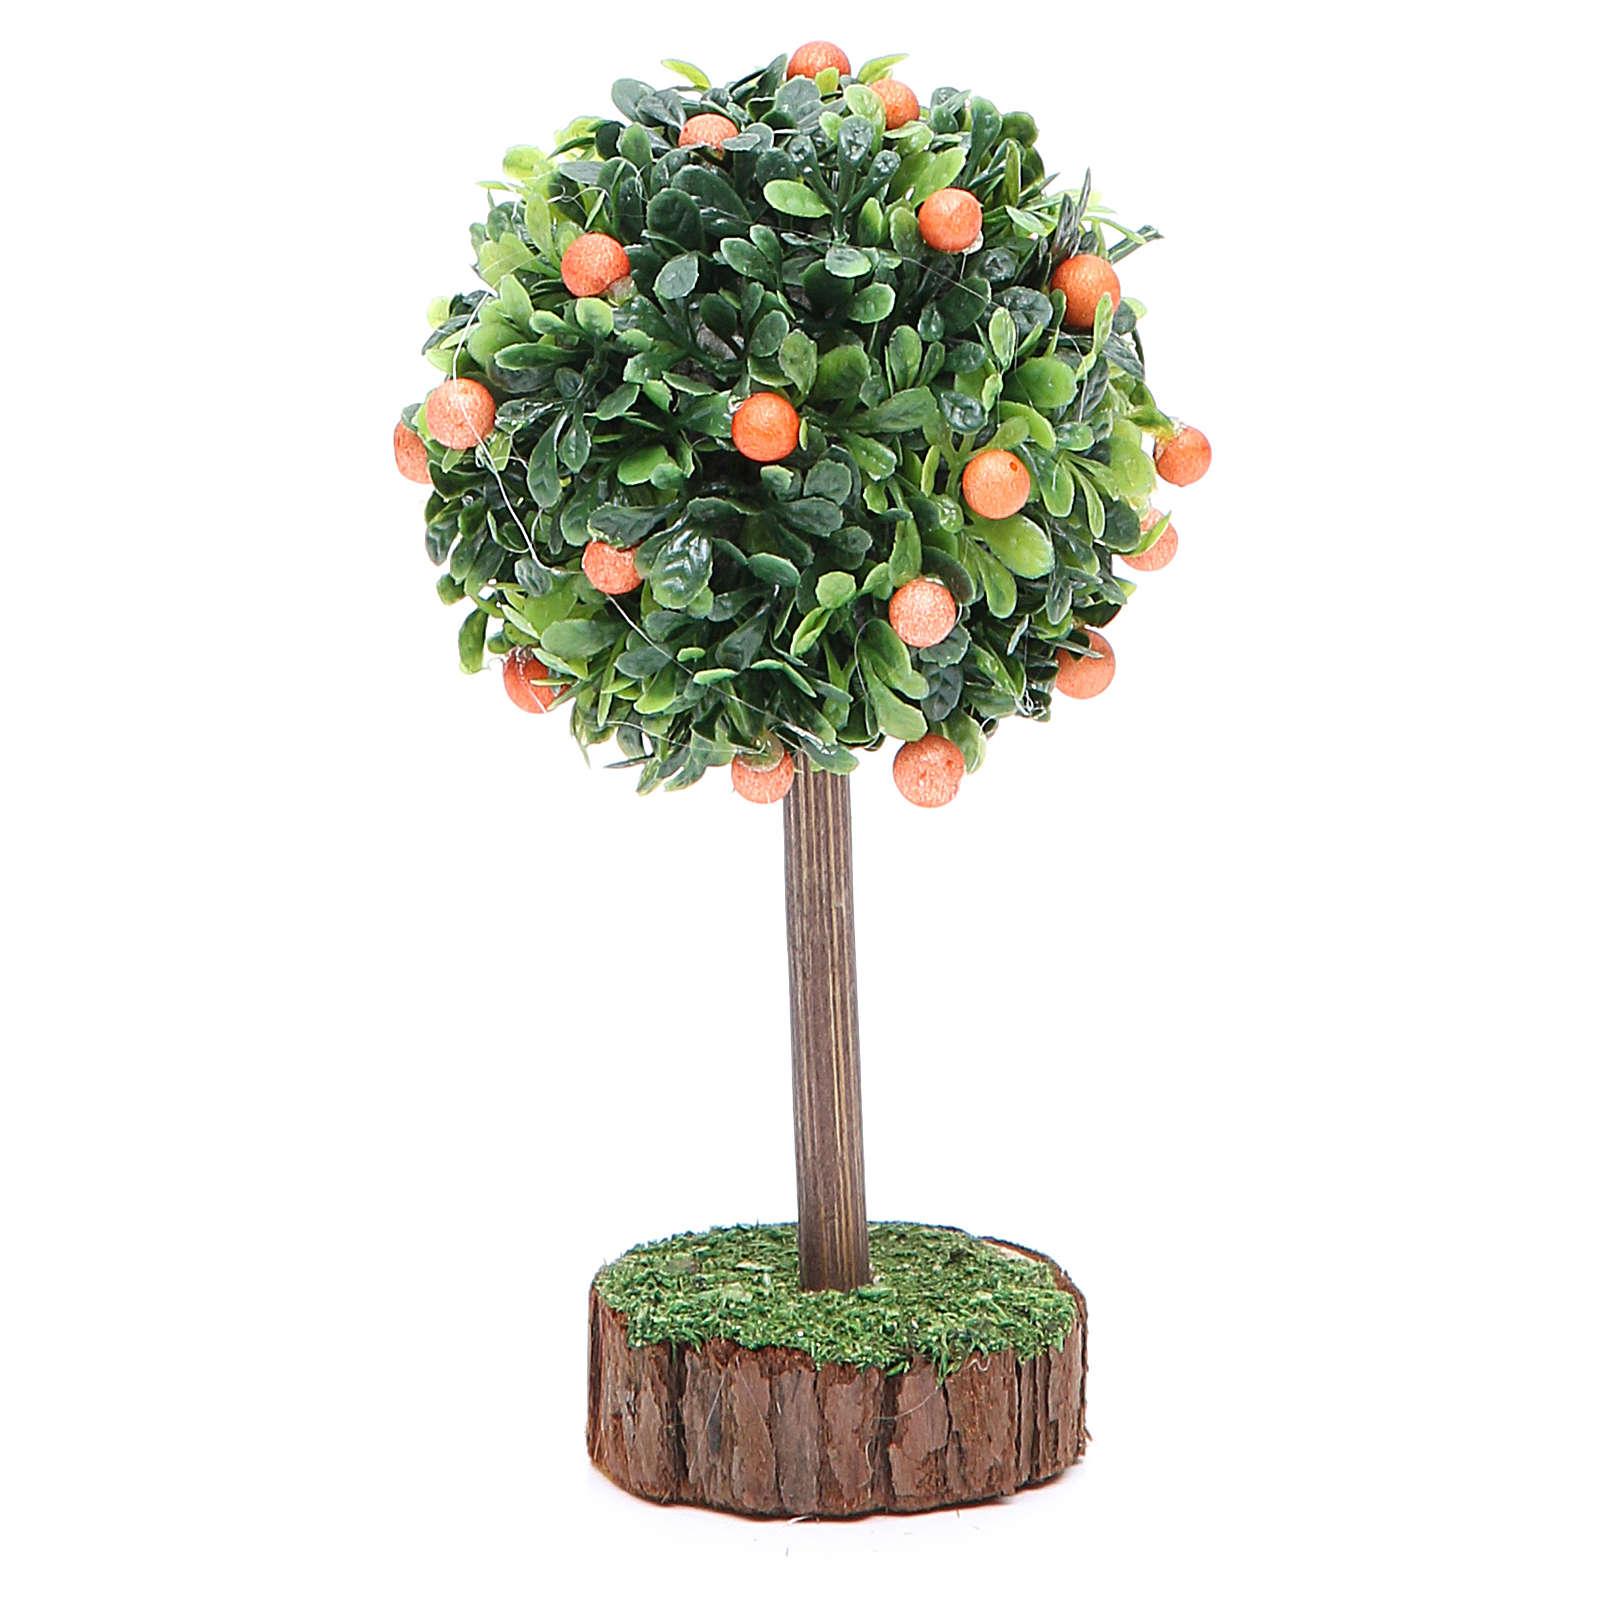 Orange tree for nativity scene in wood and resin 4